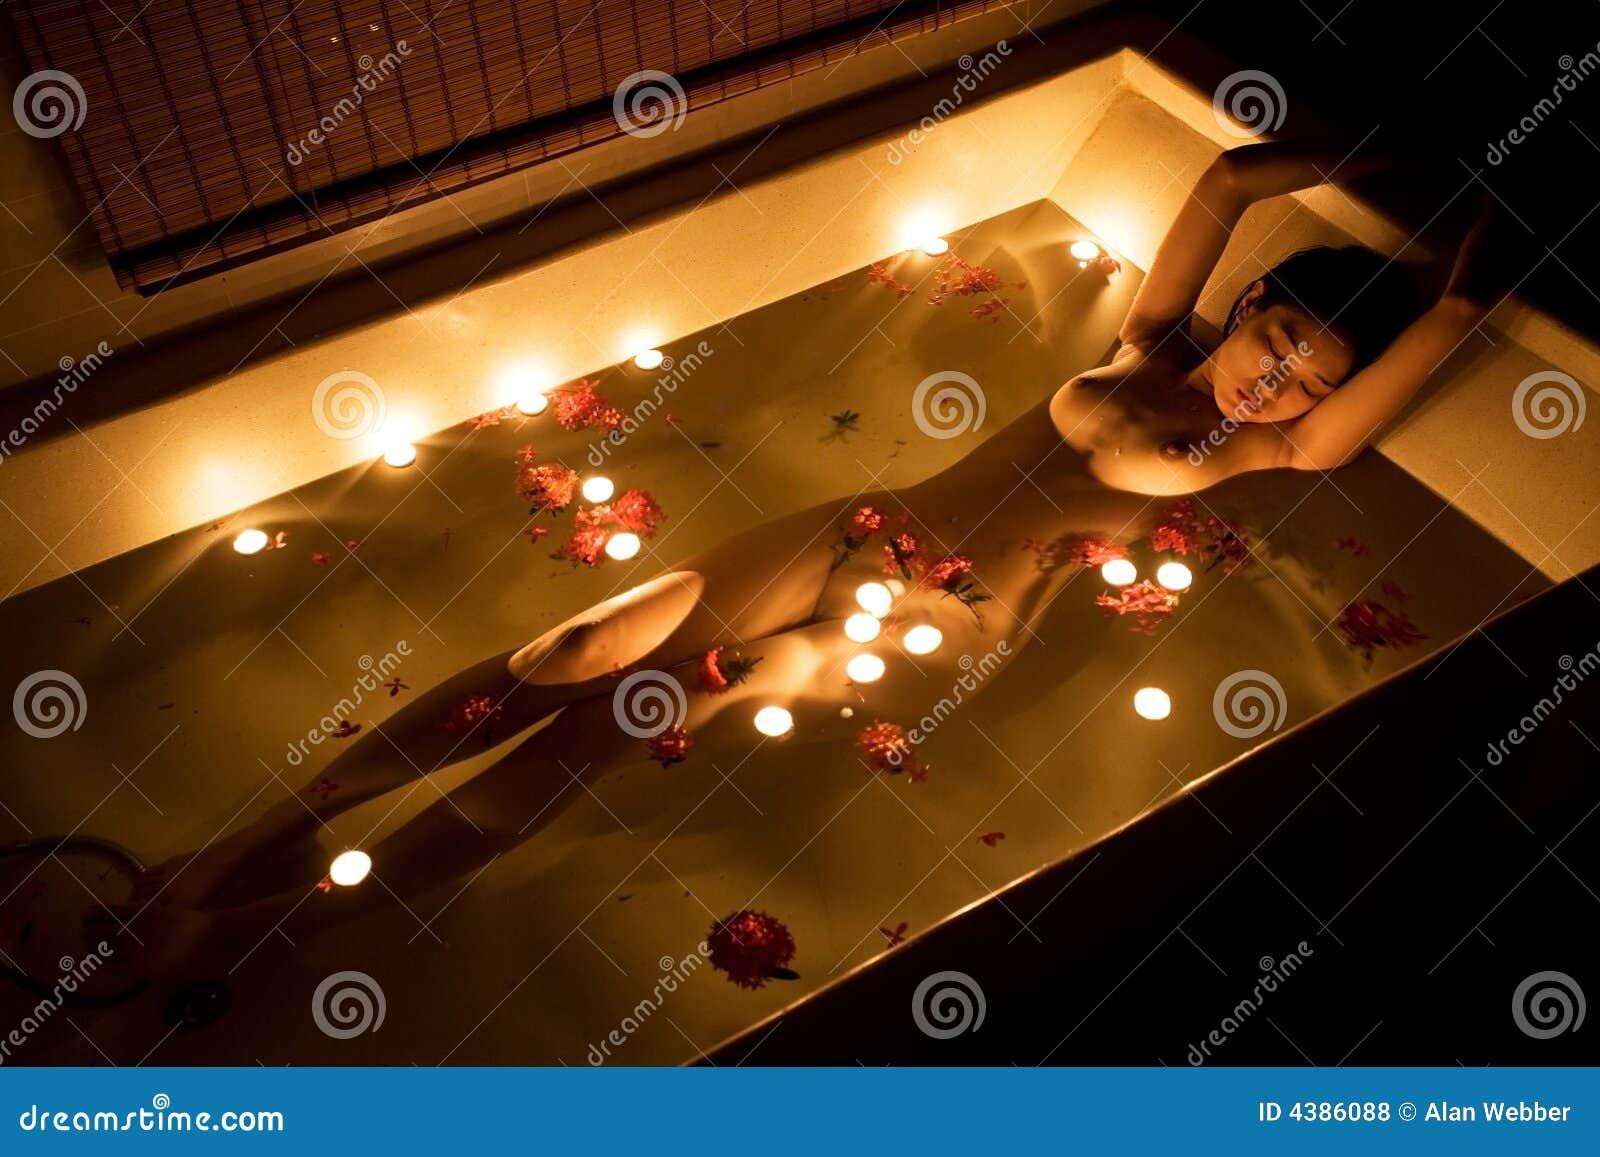 Романтик в ванной видео Вам